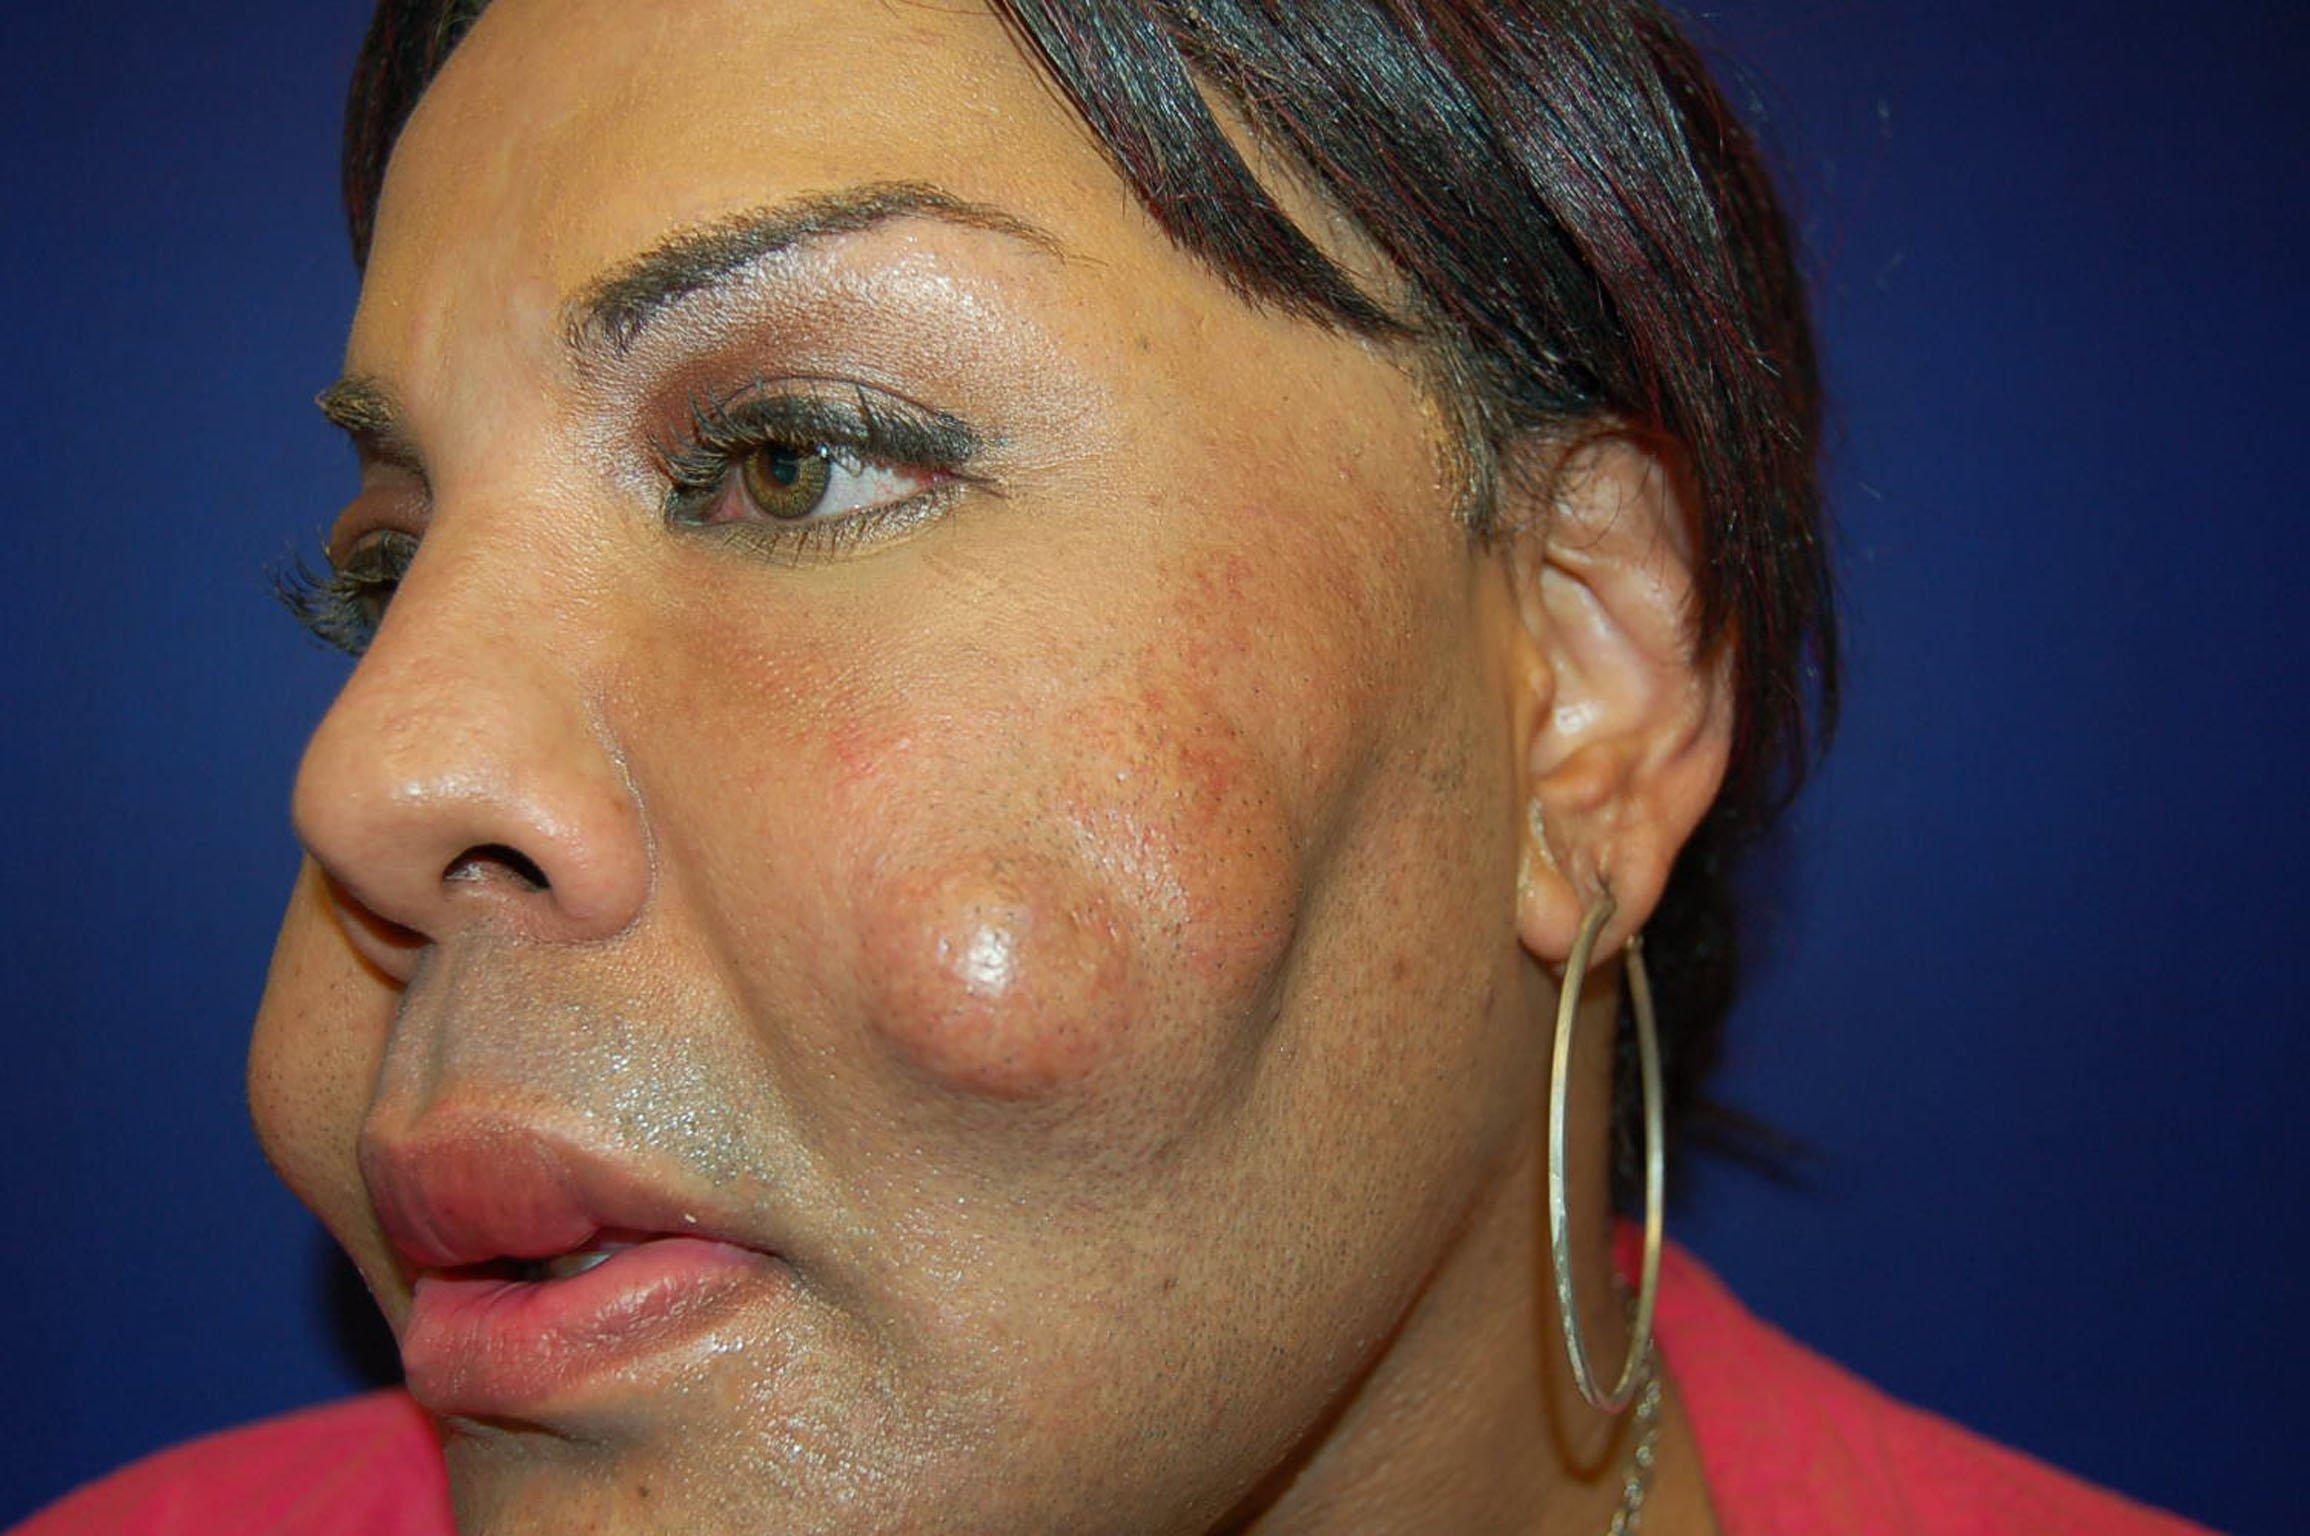 Tranny with 100 plastic surgeries